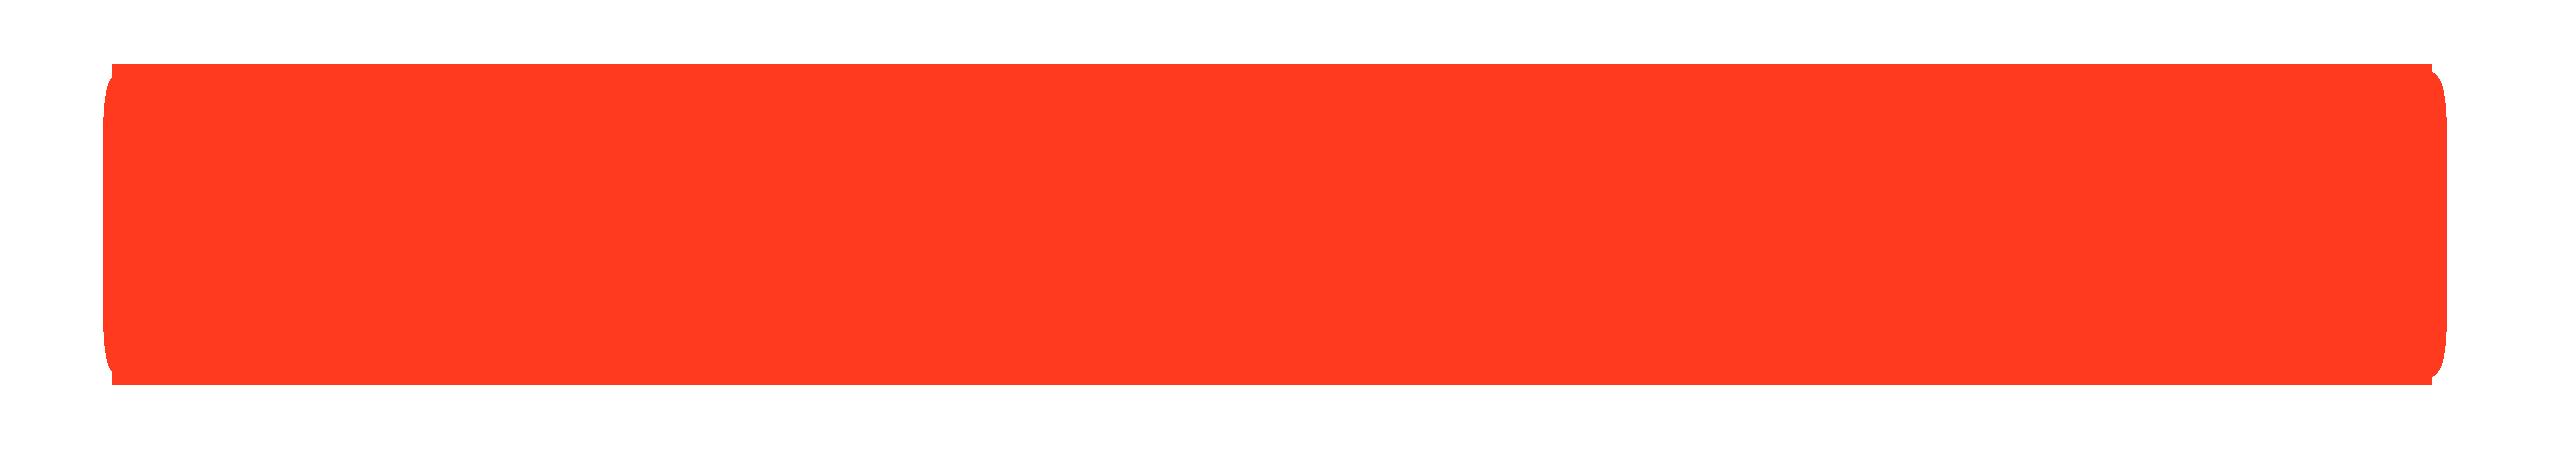 Evolve Logos